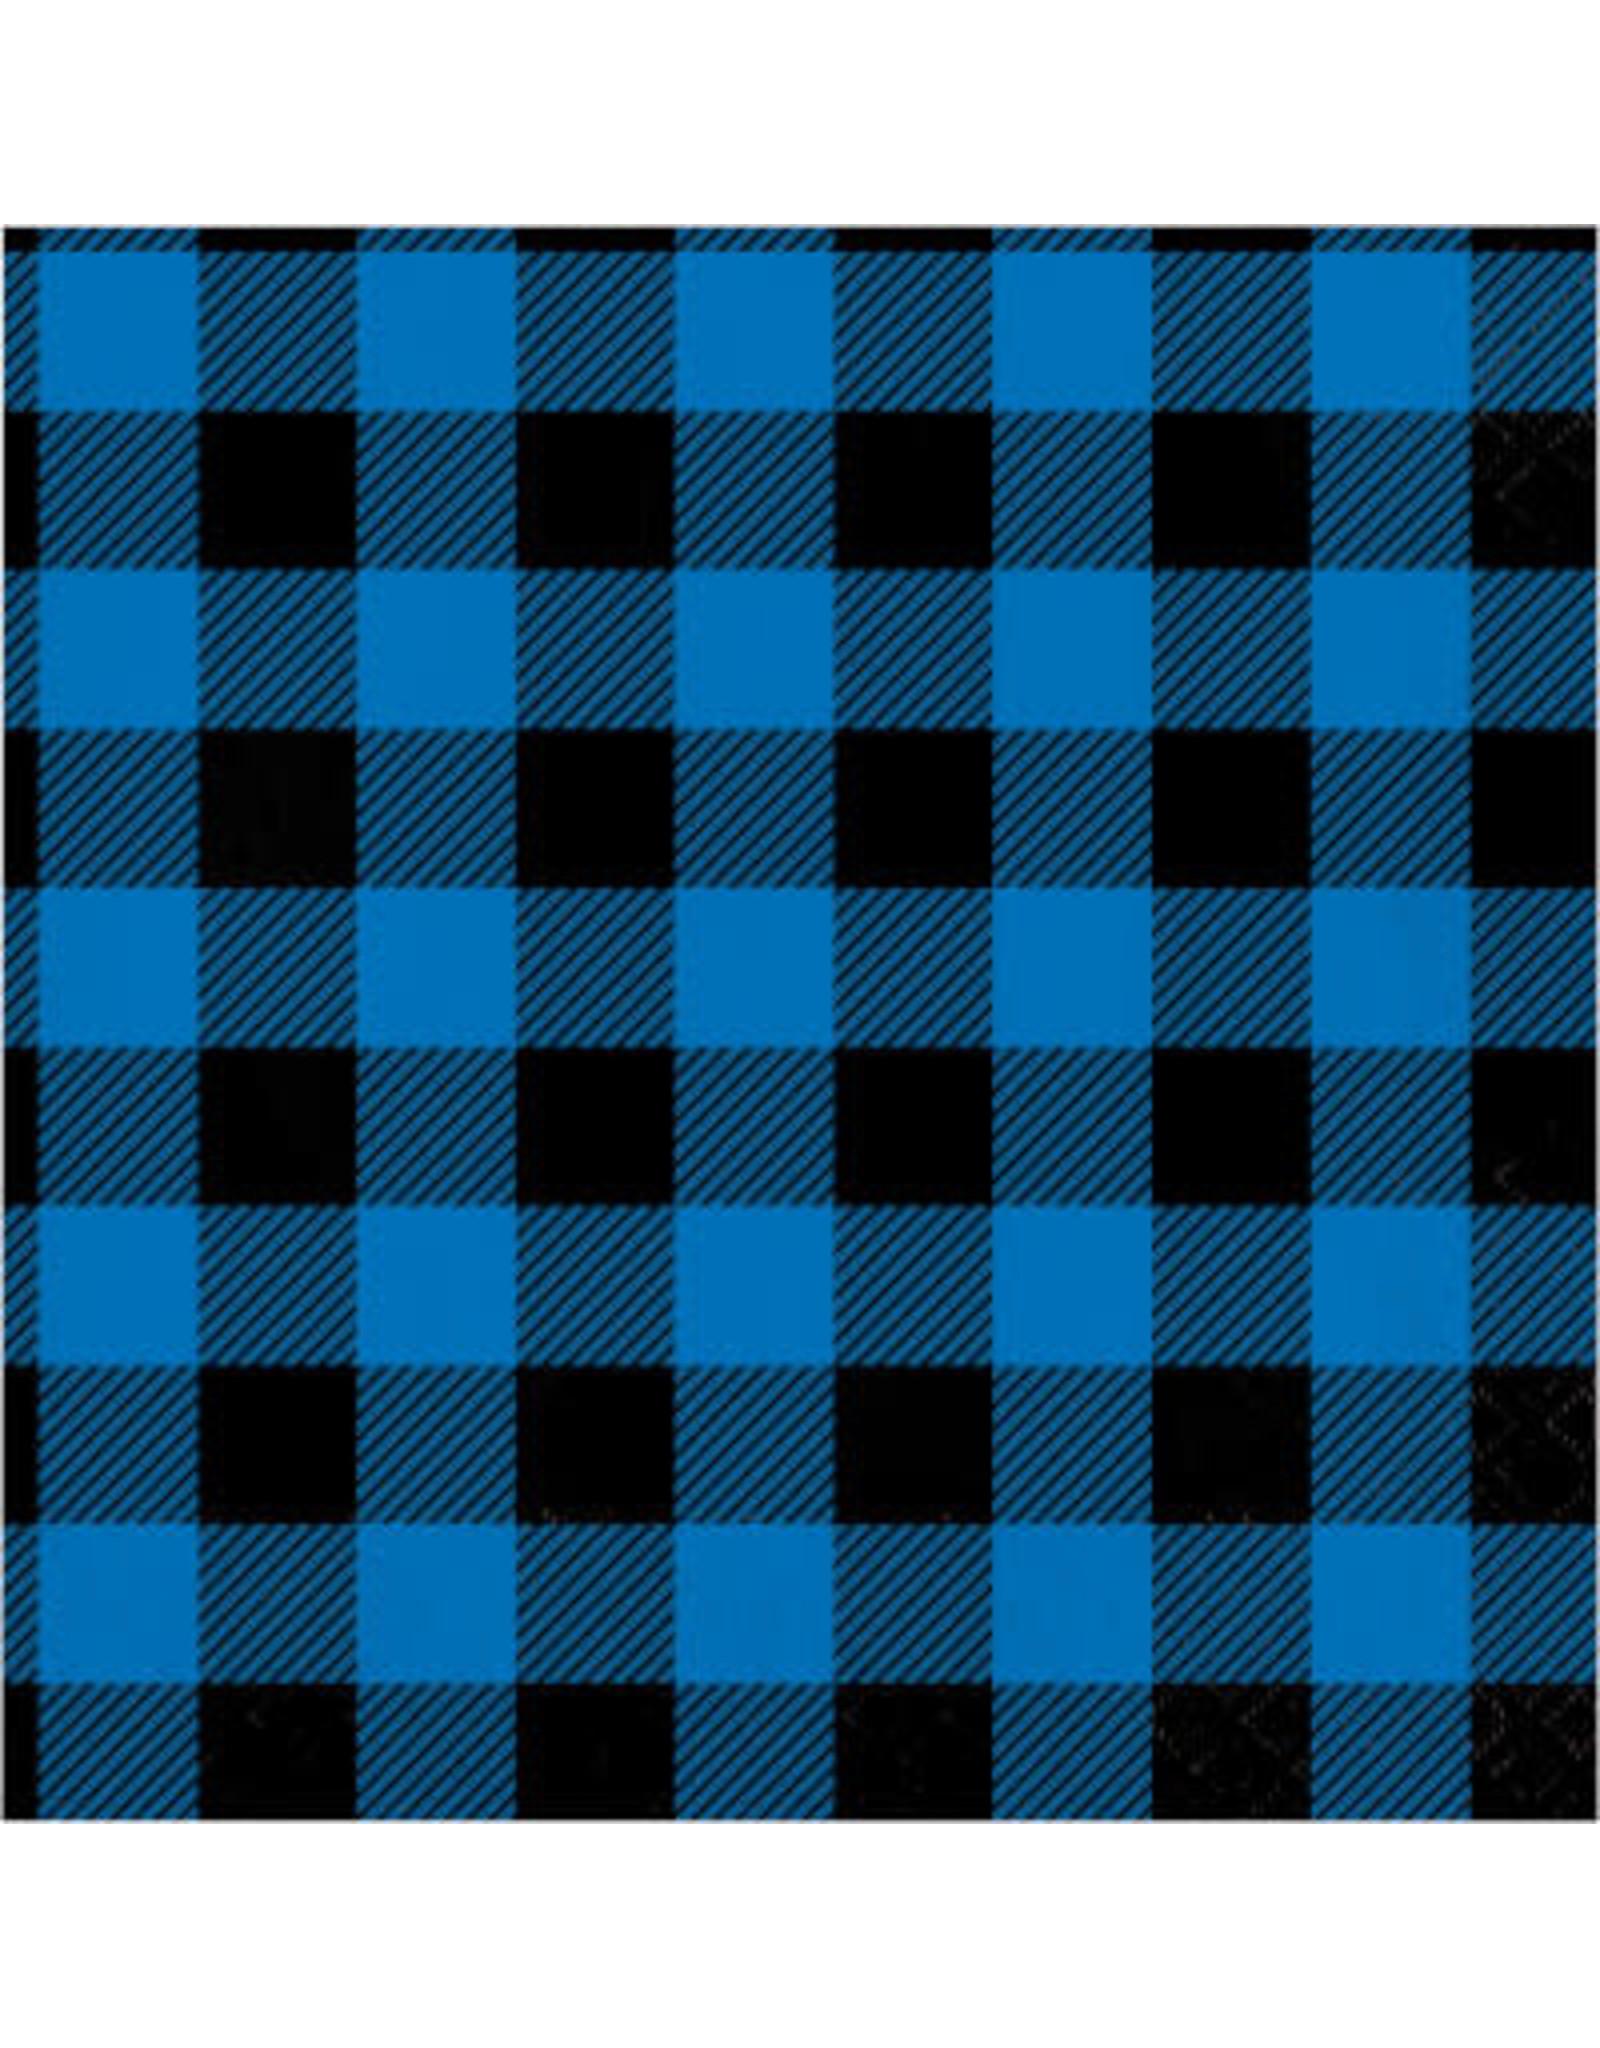 creative converting Blue & Black Buffalo Plaid Lun. Napkins - 16ct.